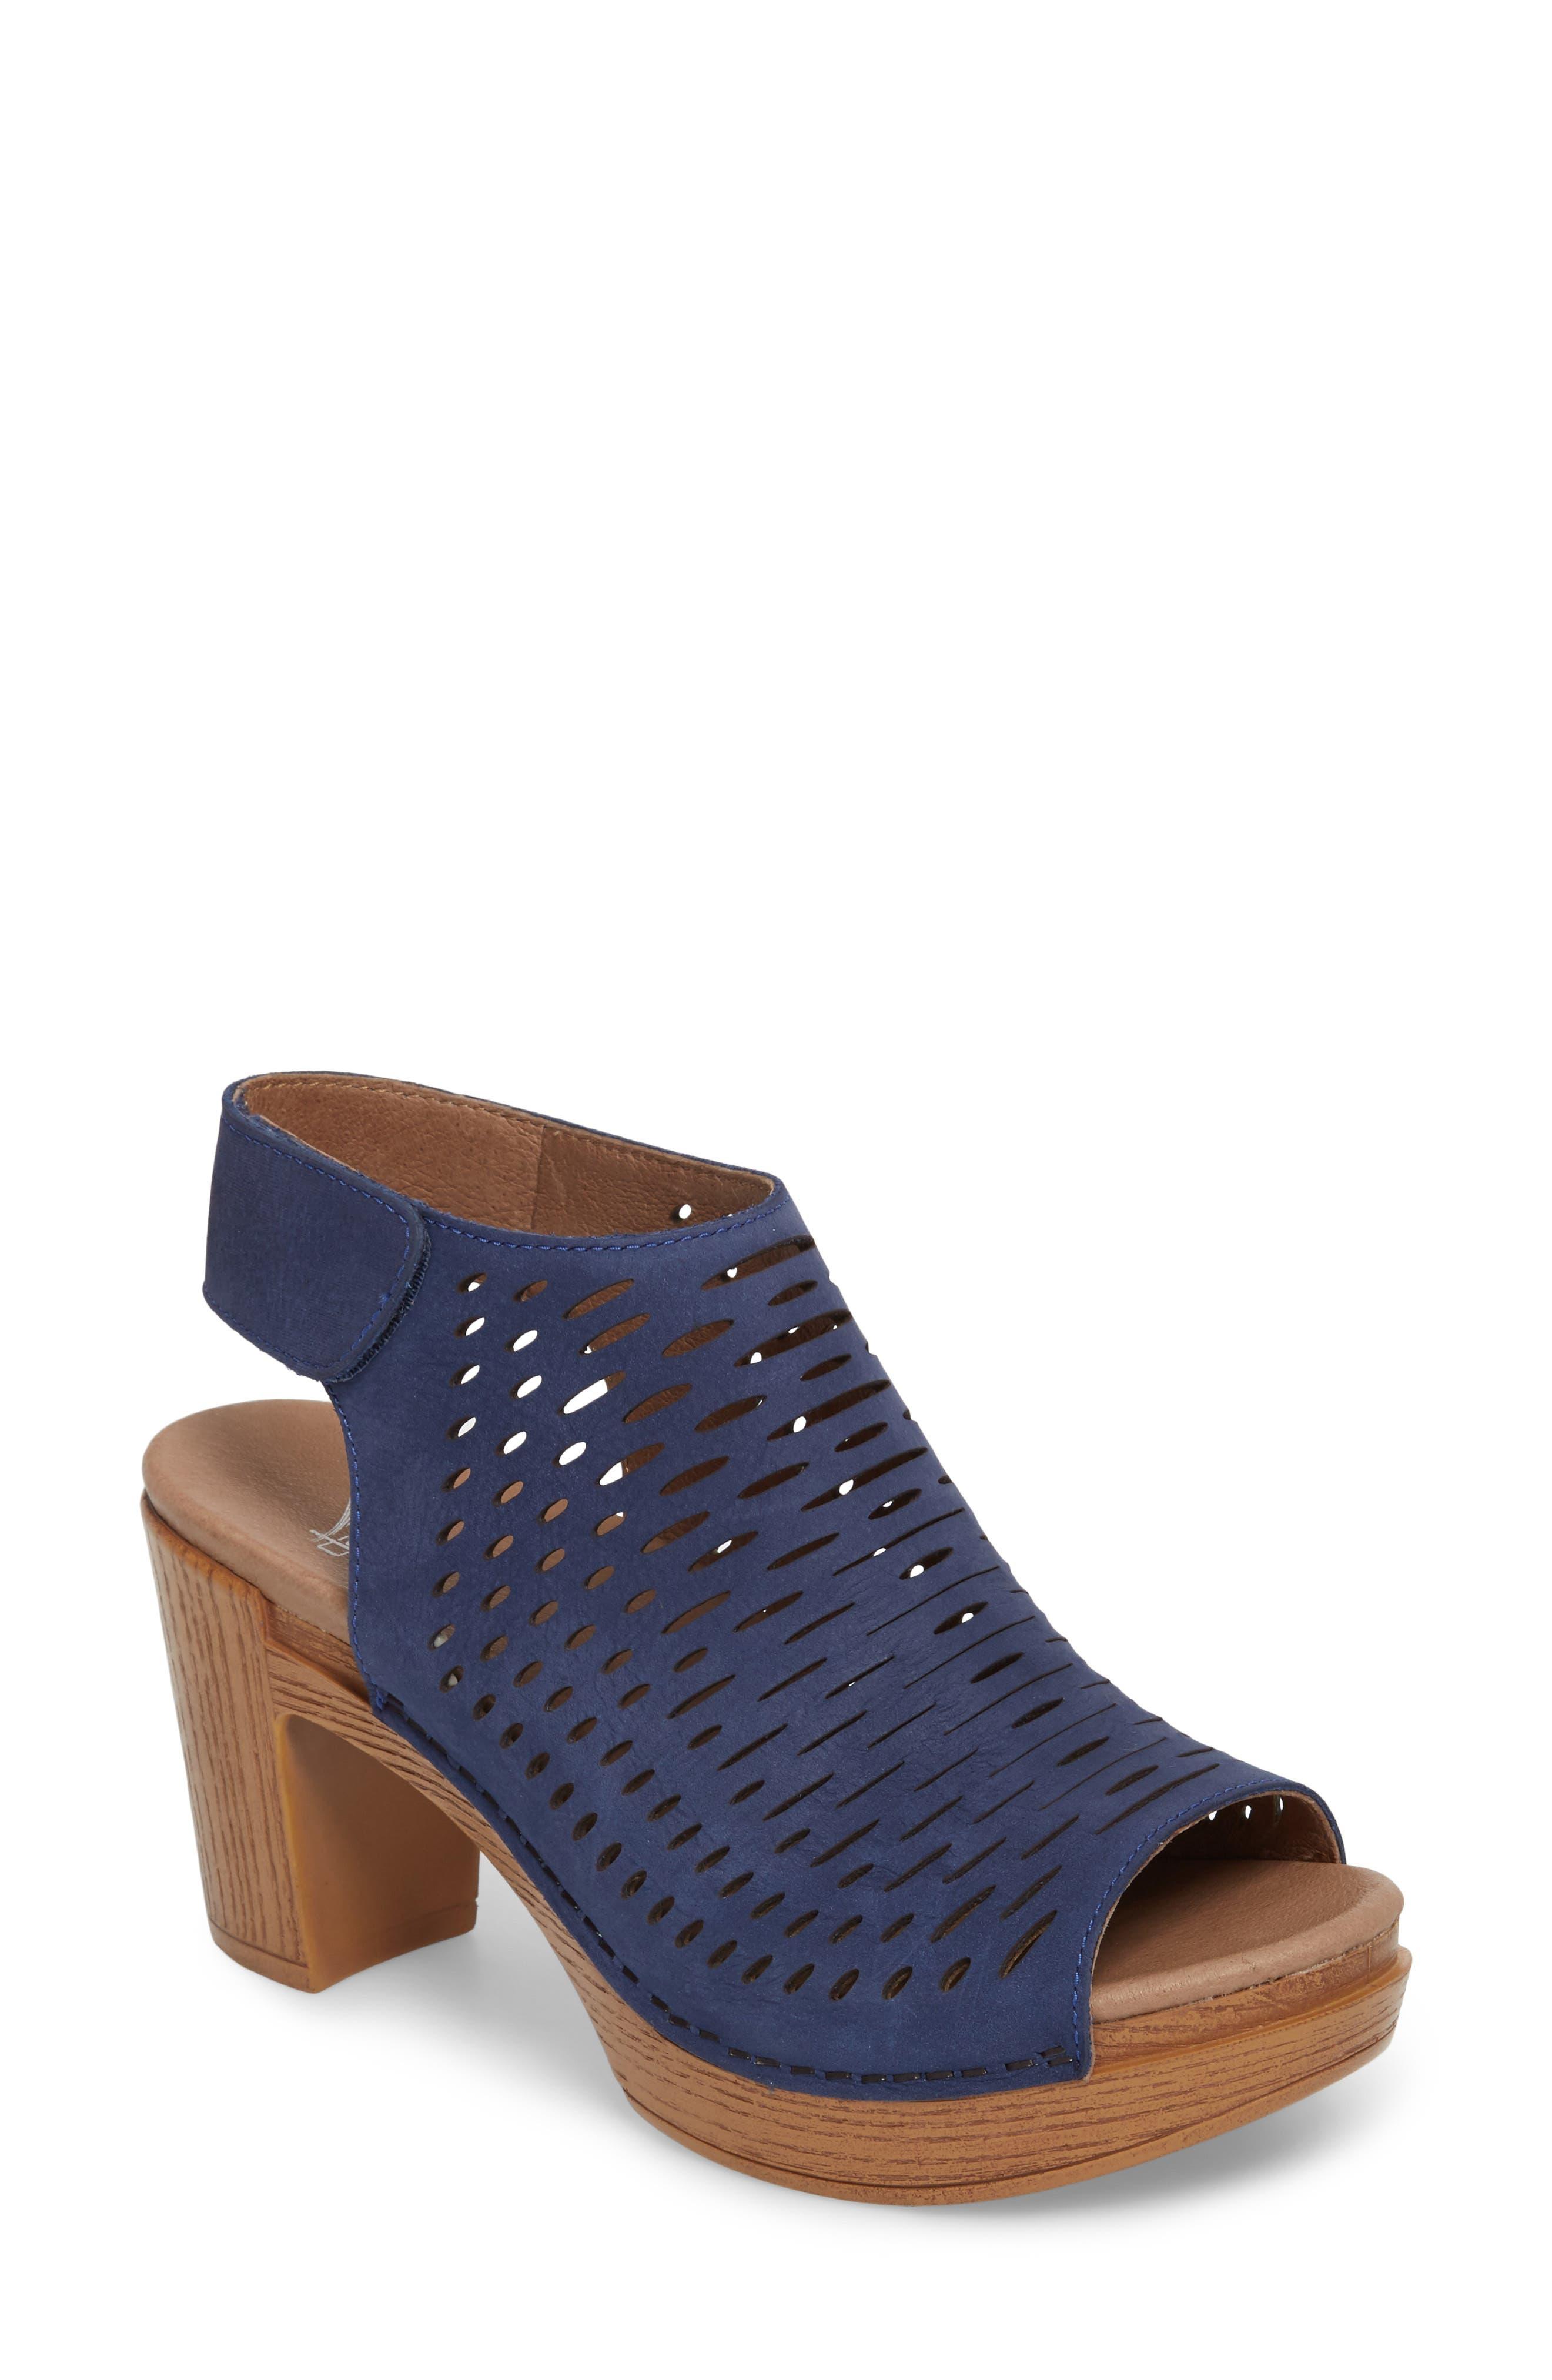 Danae Block Heel Sandal,                             Main thumbnail 1, color,                             Blue Milled Nubuck Leather